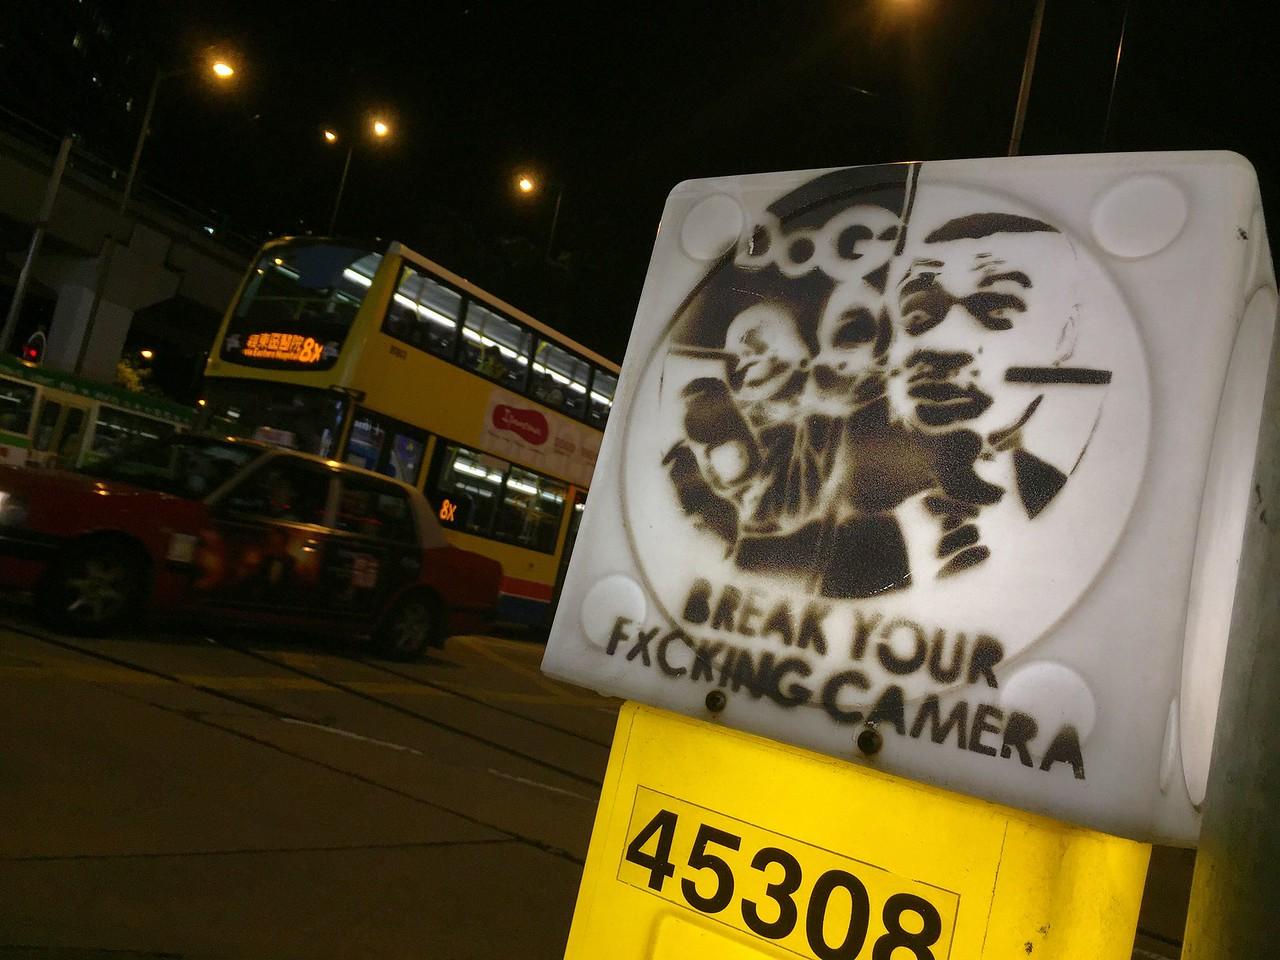 Break your F*** Camera